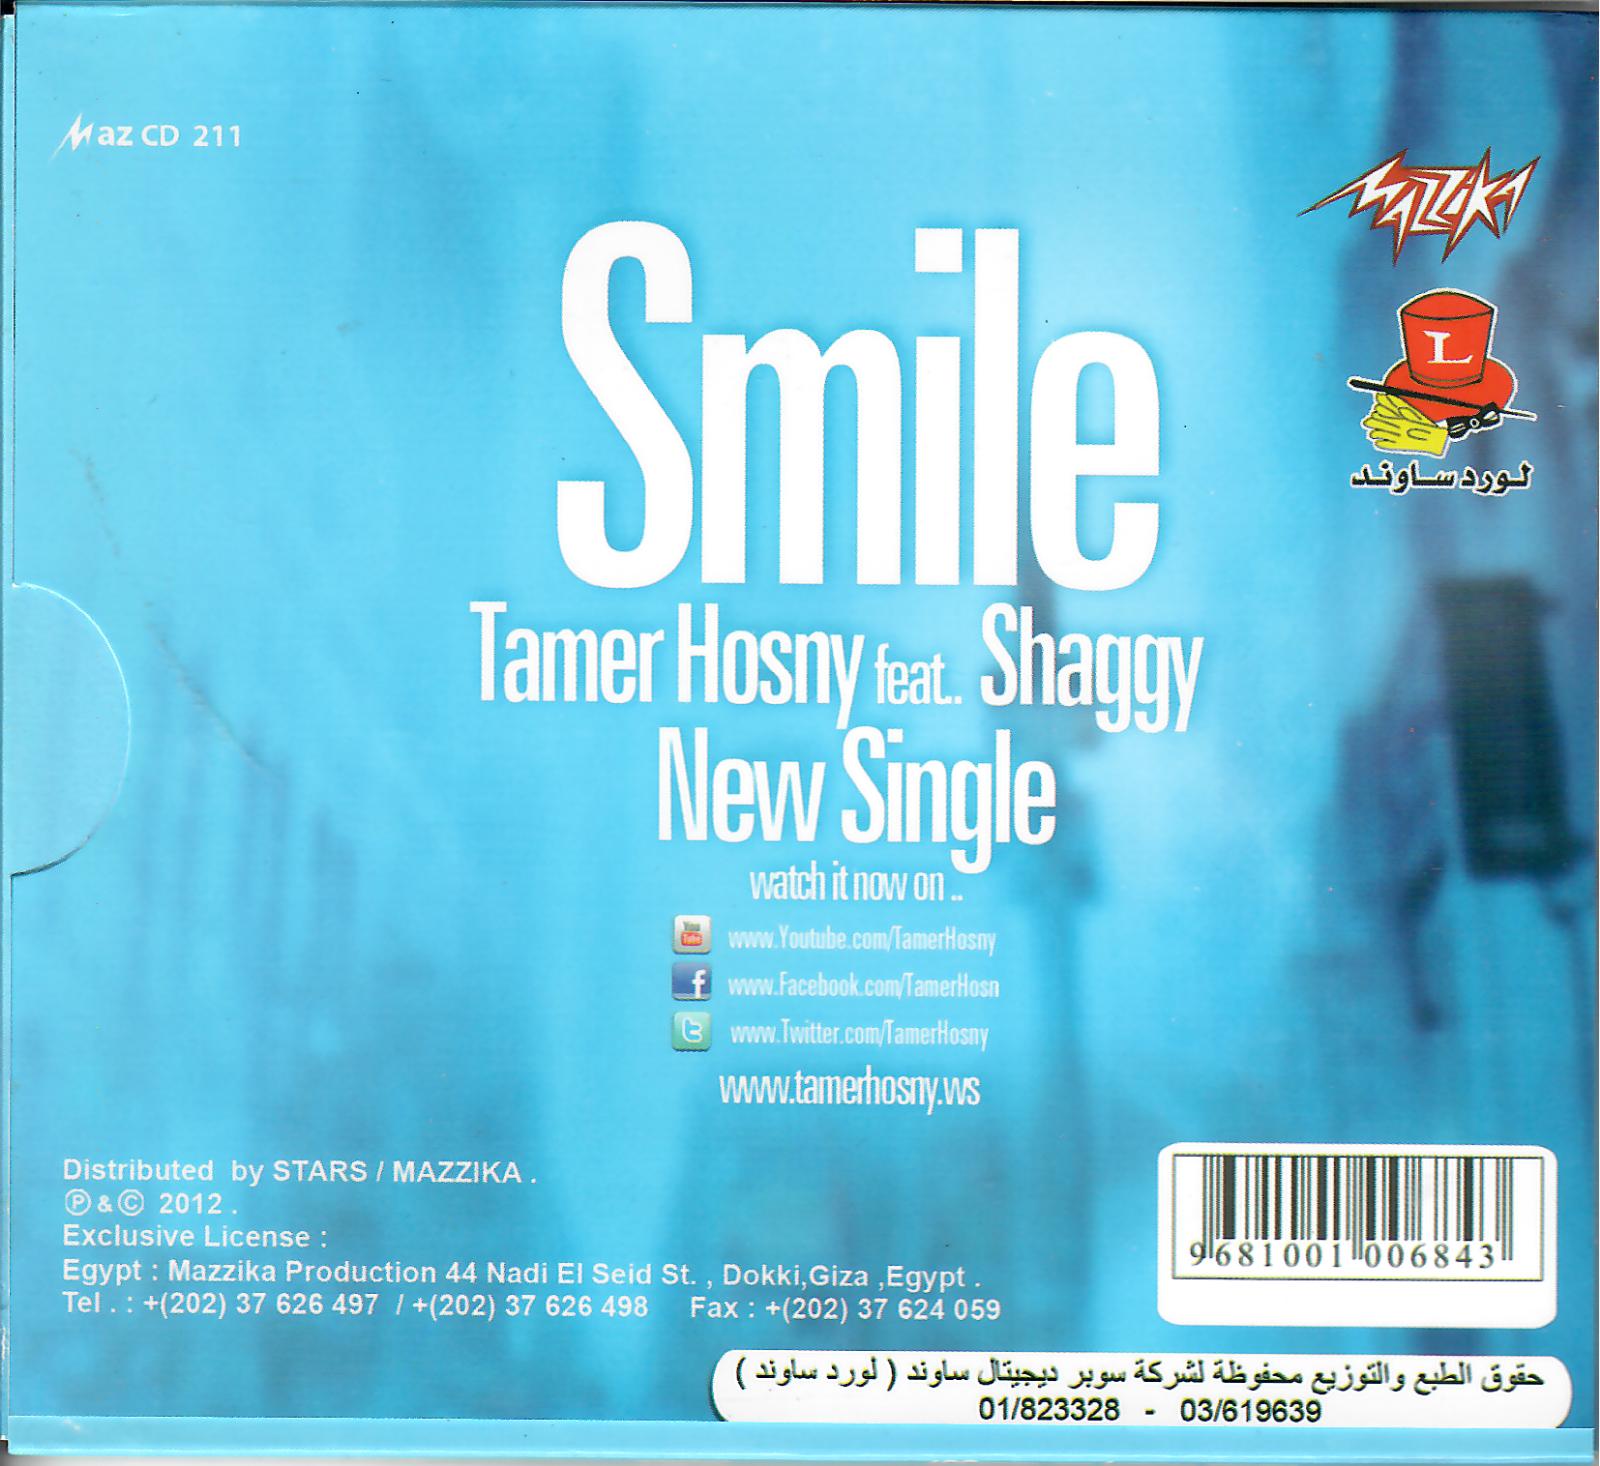 TAMER HOSNY, SHAGGY: Gara Eh, Omar w Salma Songs-Nos Lam7a, Bent Lazina 2  CD SET